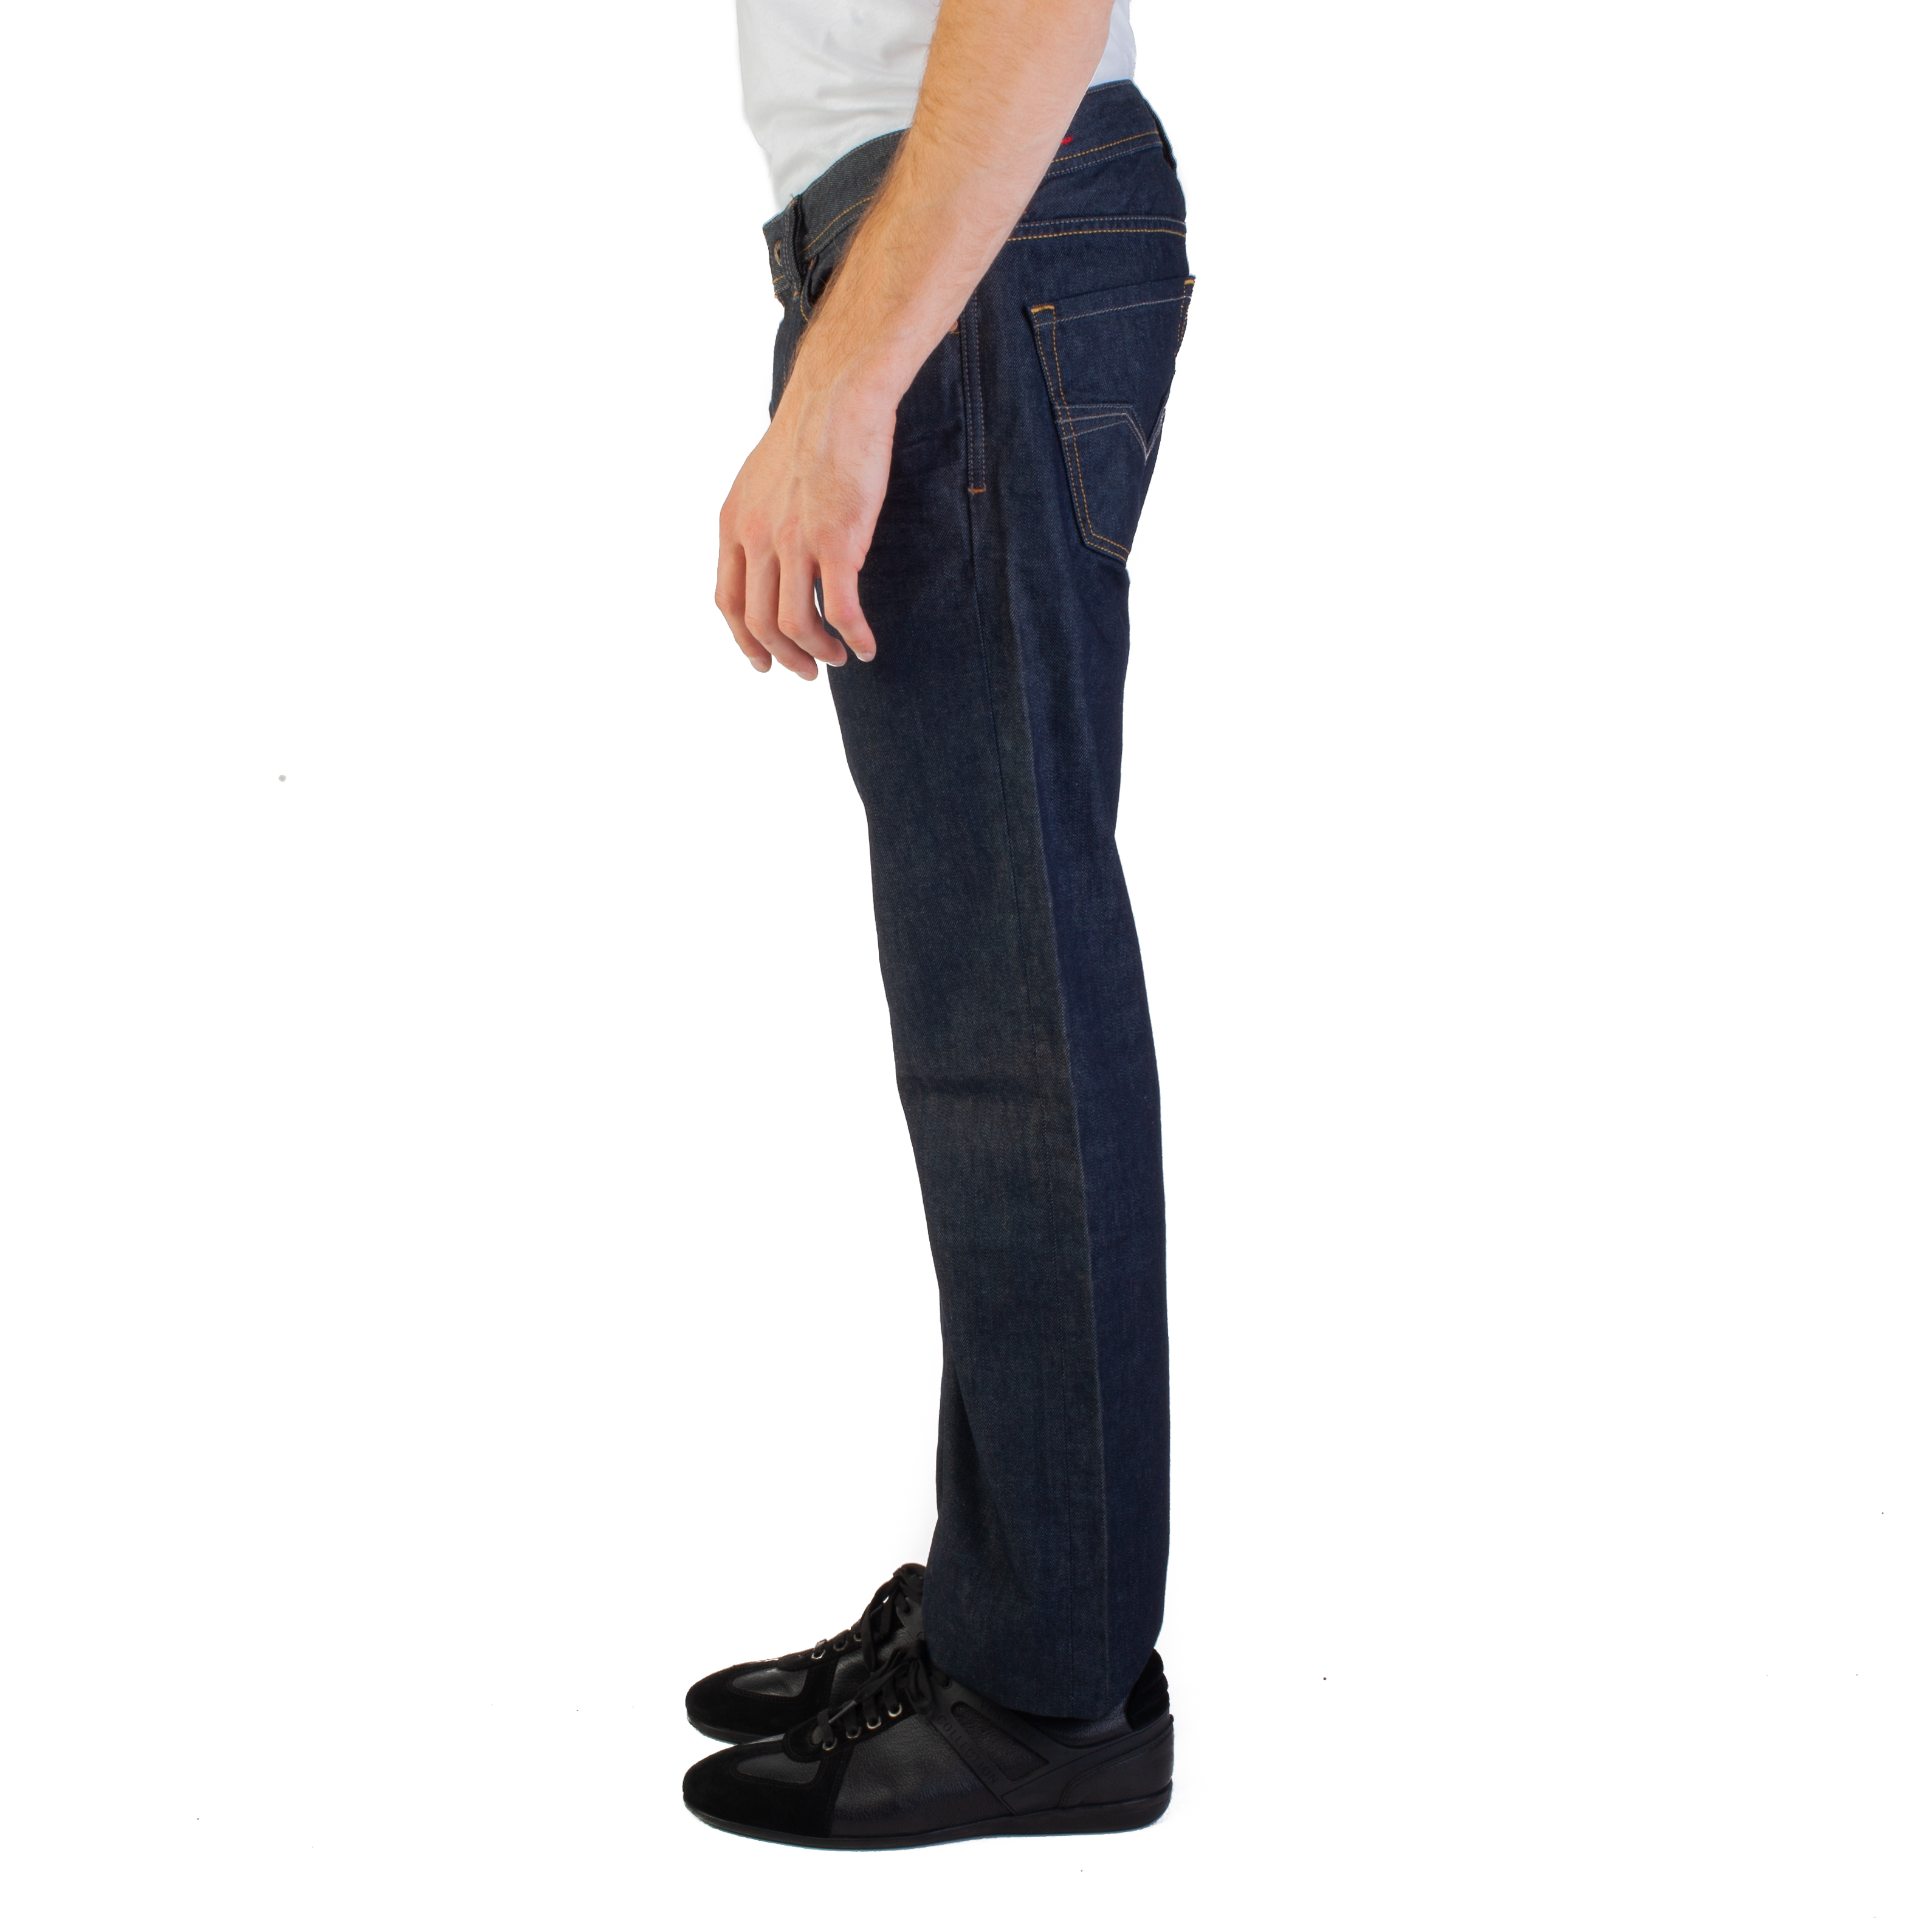 diesel 008Z8 Regular-Straight Fit Larkee maschile pantaloni jeans blu scuro c8a343a6042